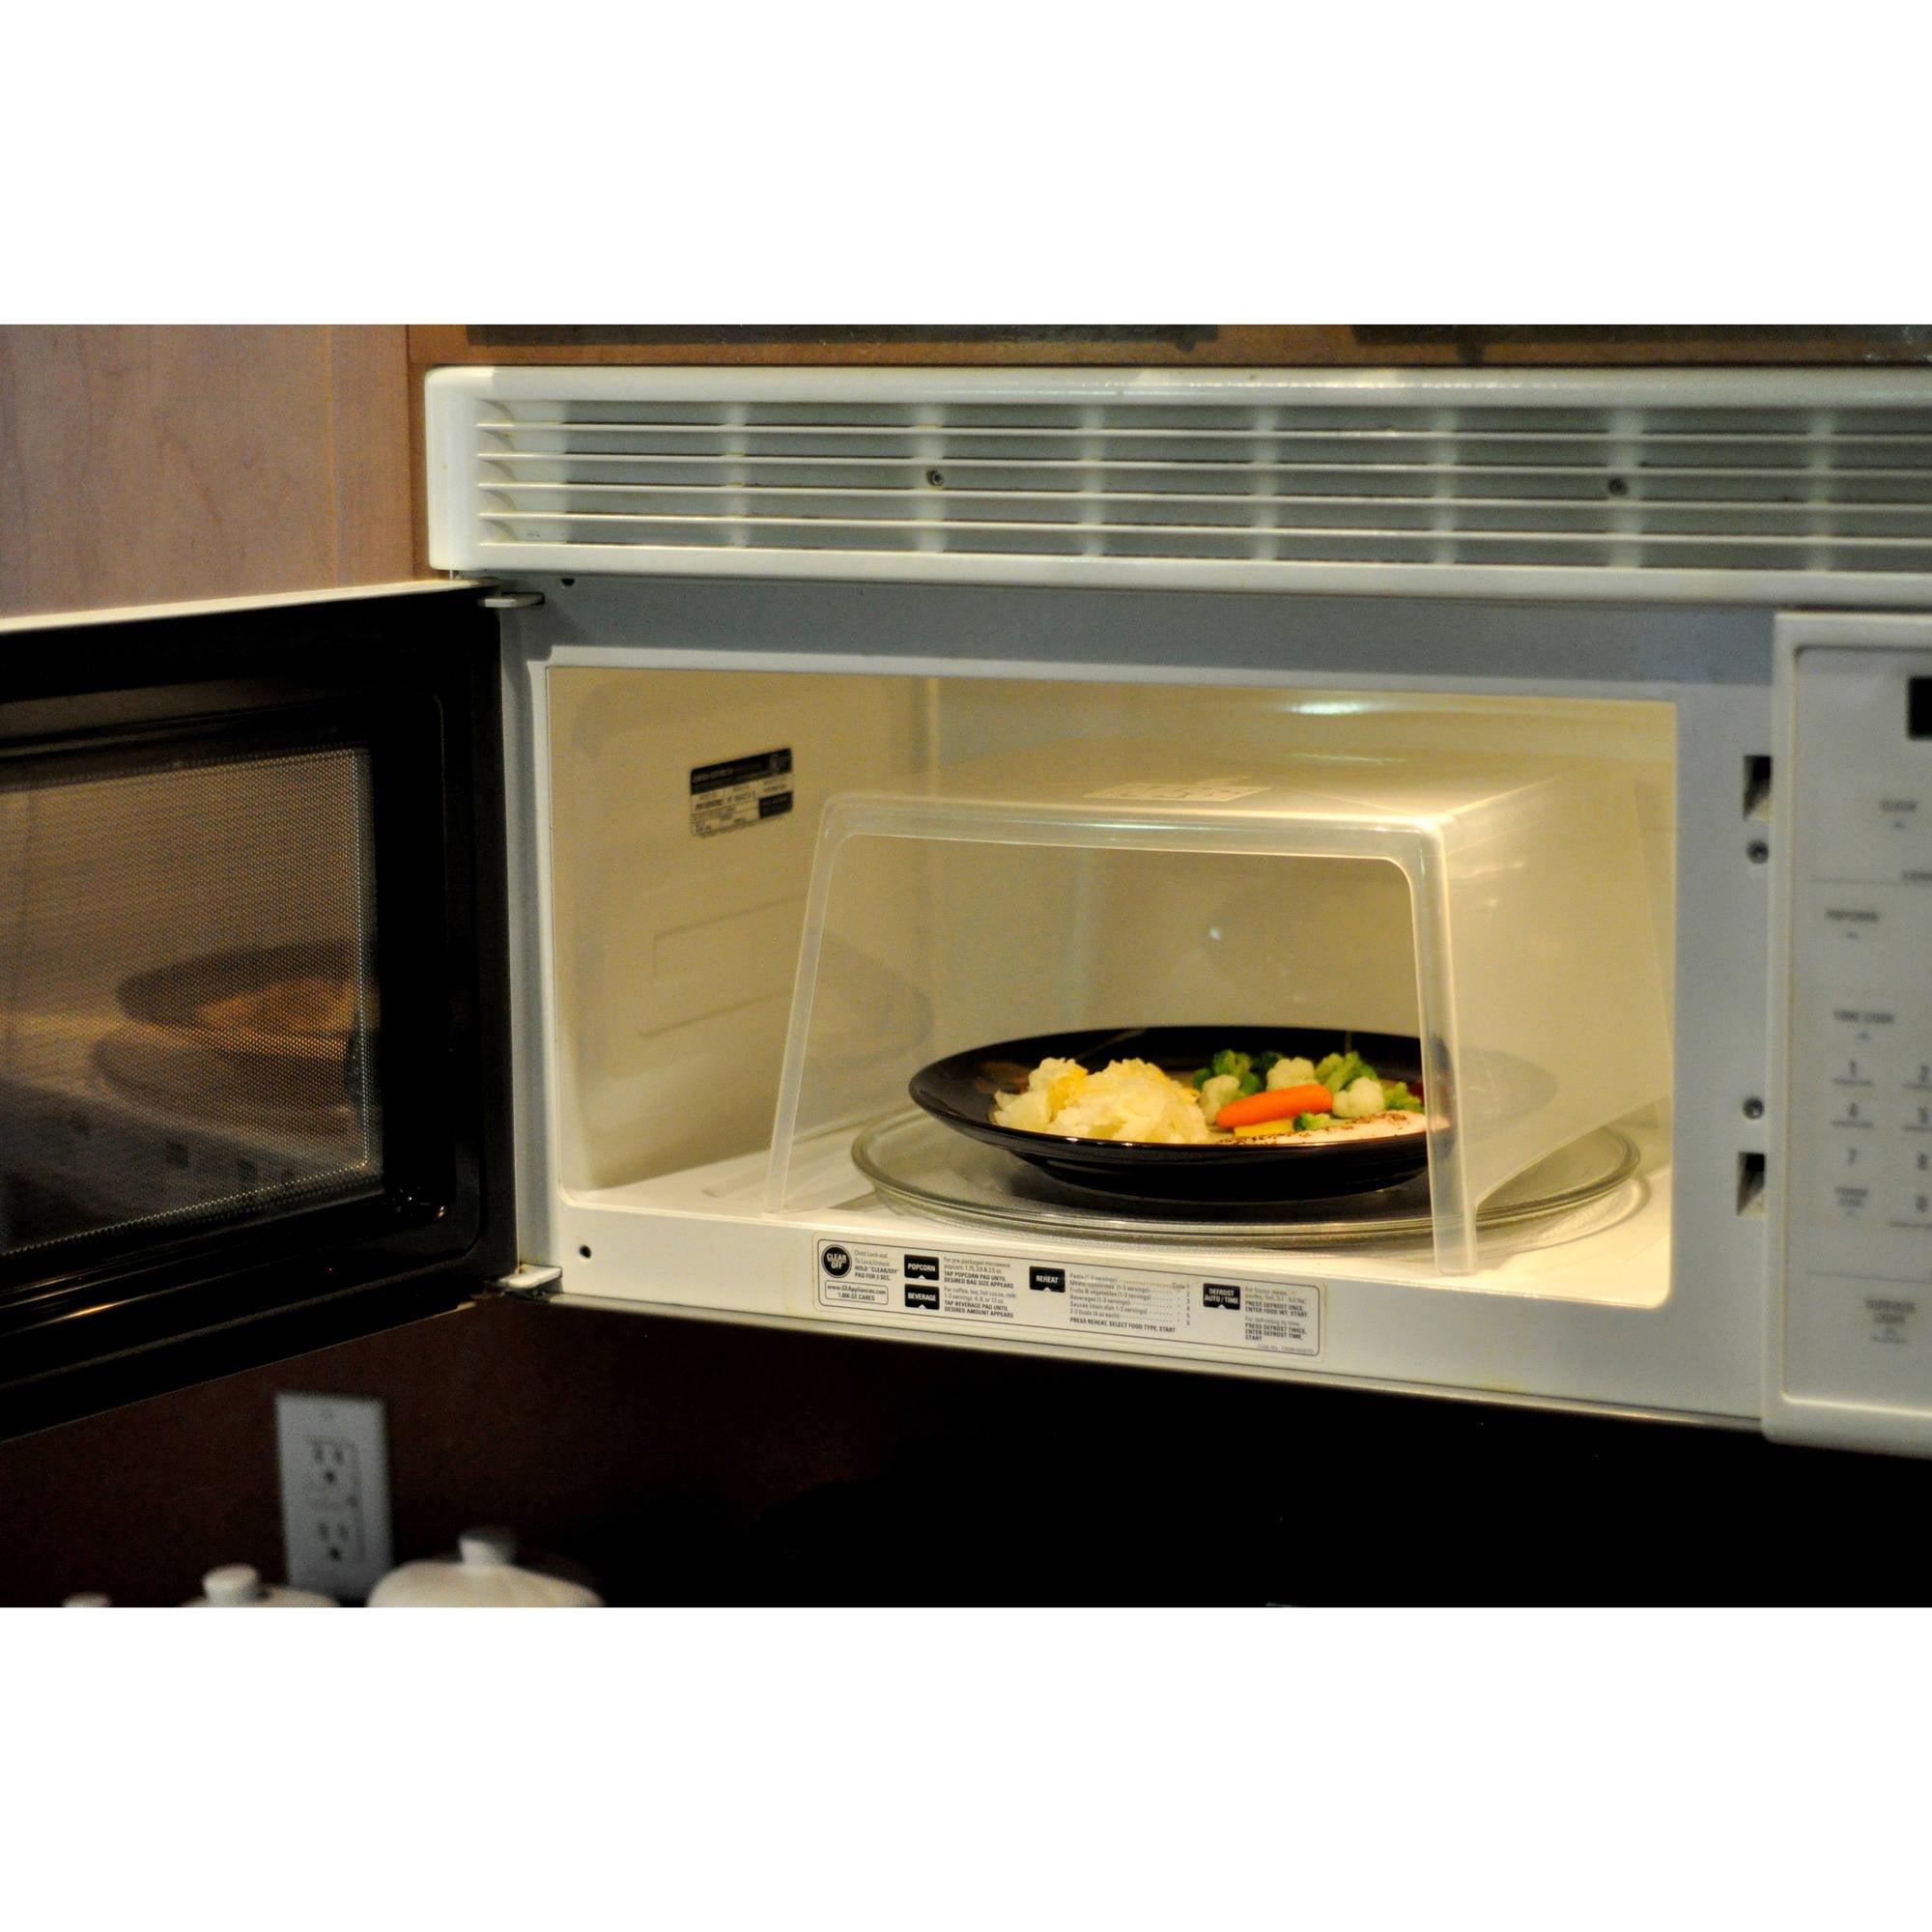 Microwave Super Guard Microwave Splatter Guard   Walmart.com